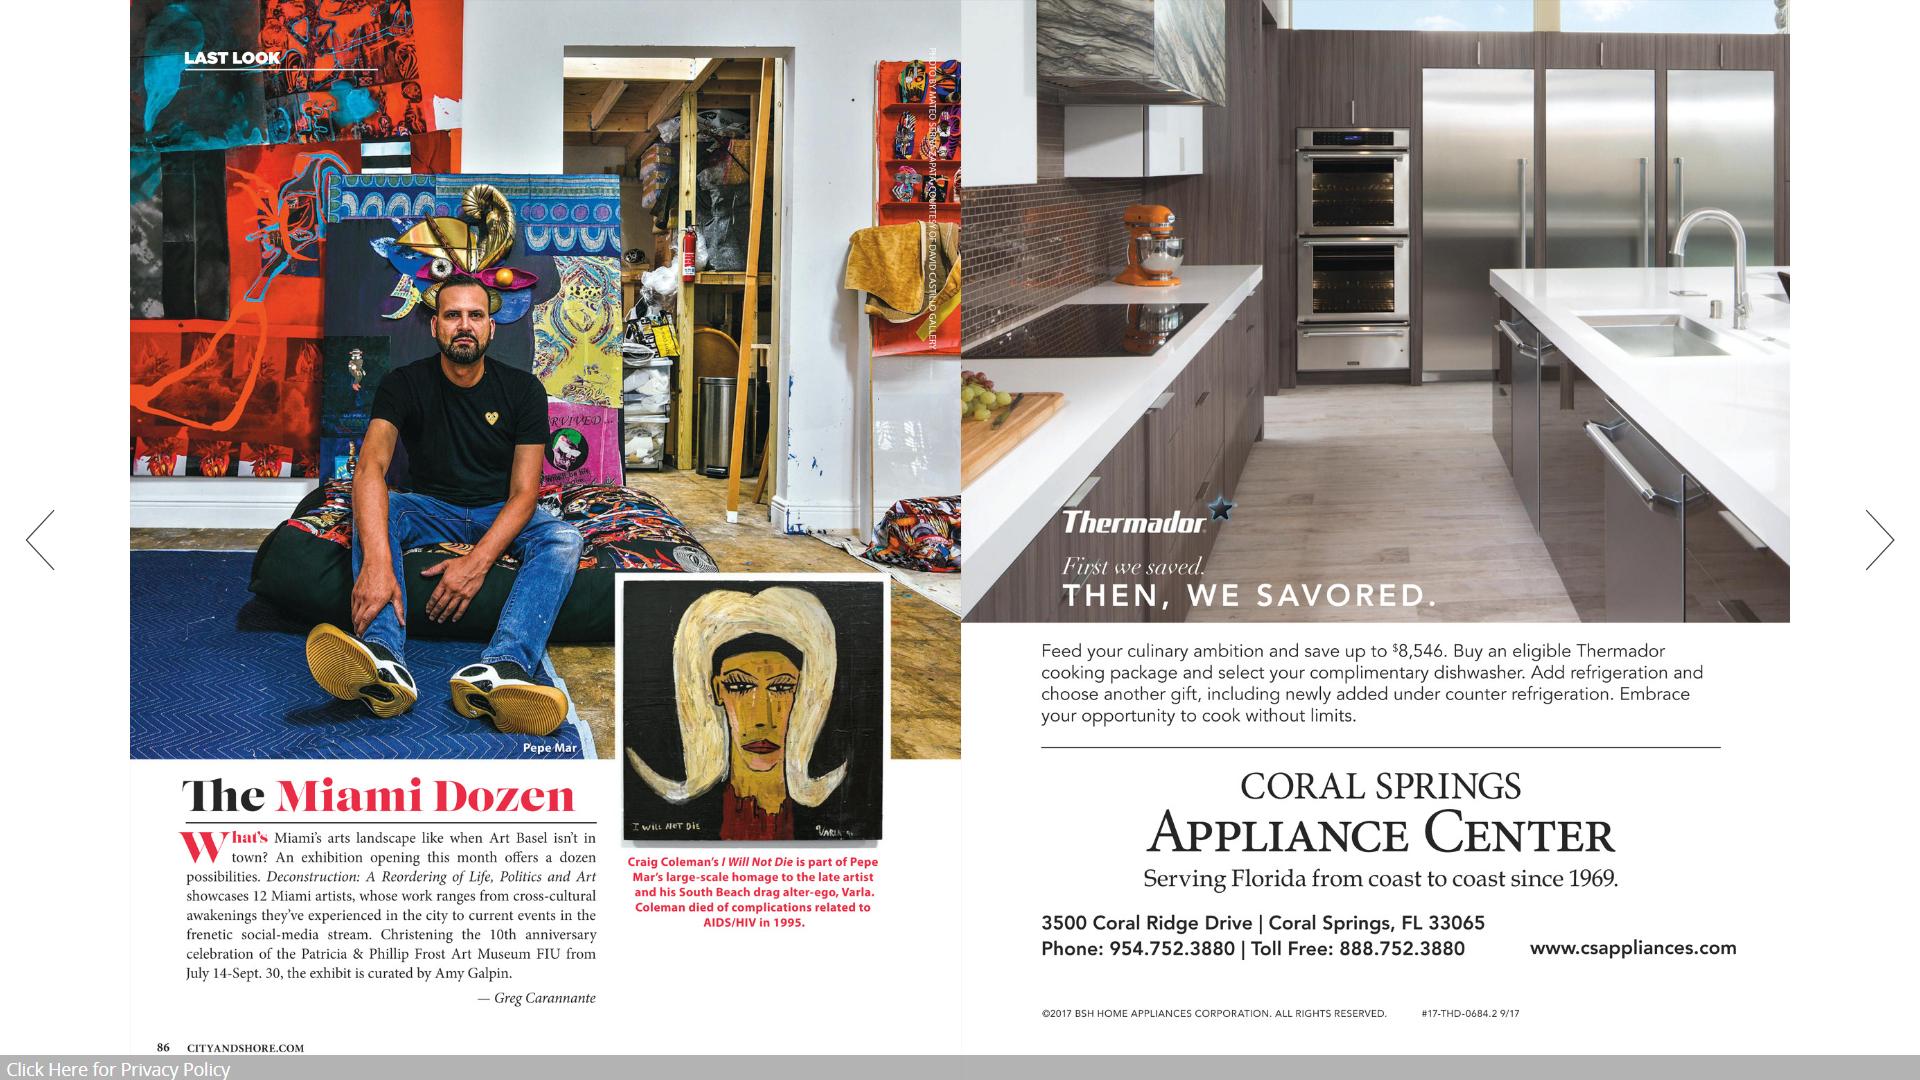 City and Shore Magazine